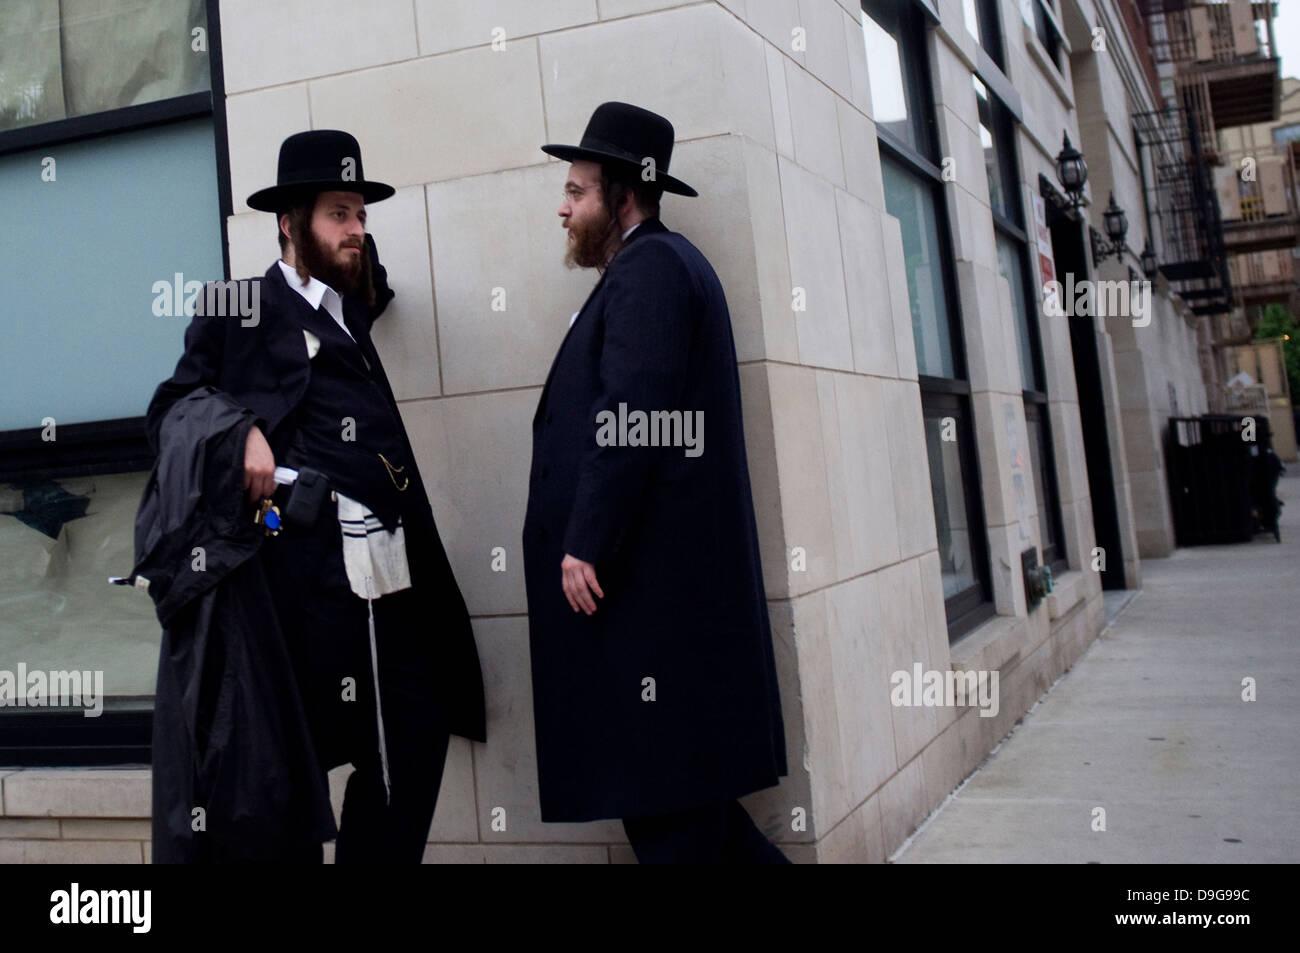 Jewish clothing stores in brooklyn ny